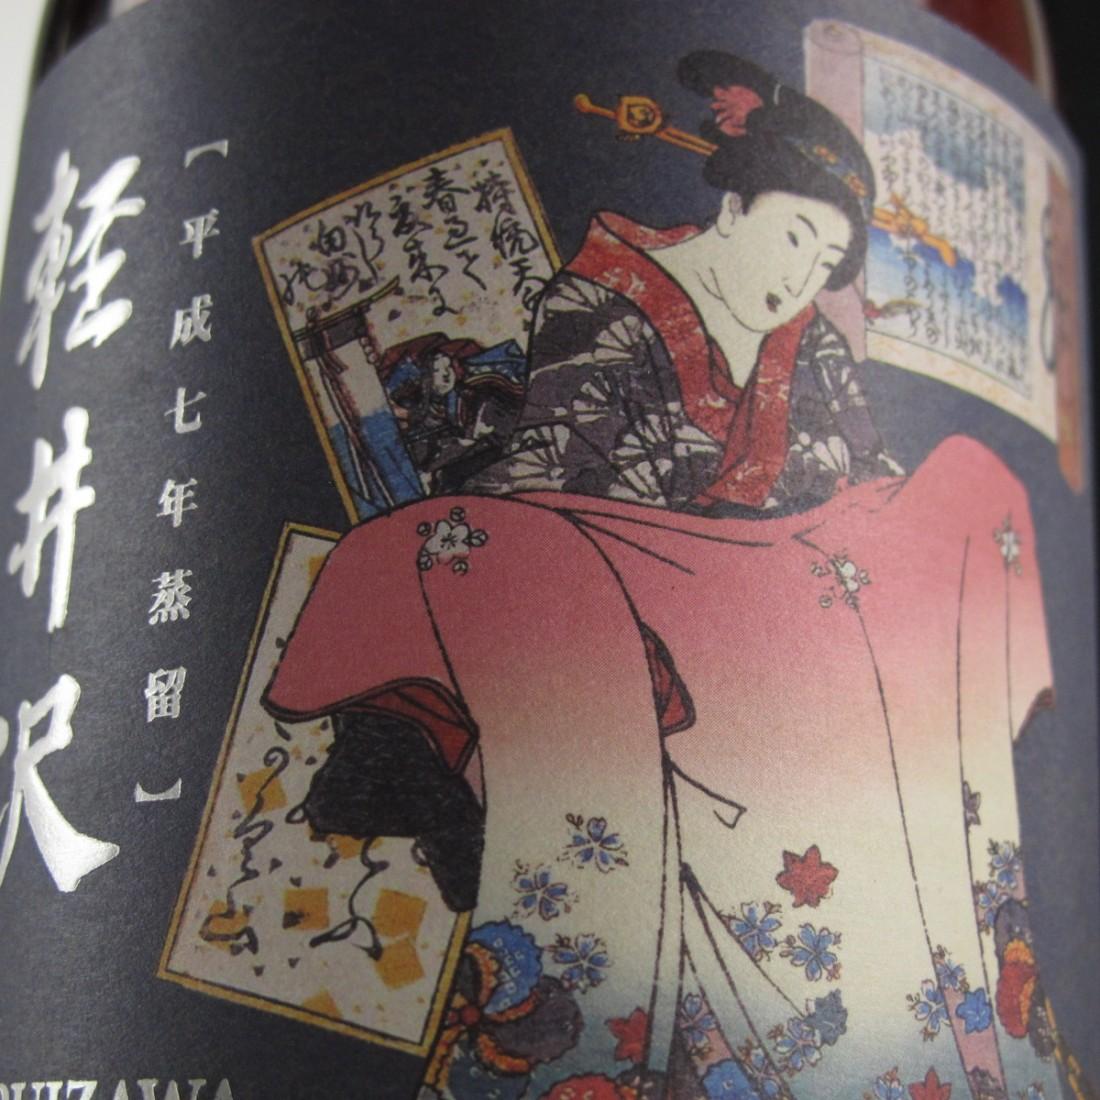 Karuizawa 1994 Single Cask #4019 & 1995 Single Cask #7891 / Geisha Label 2 x 70cl